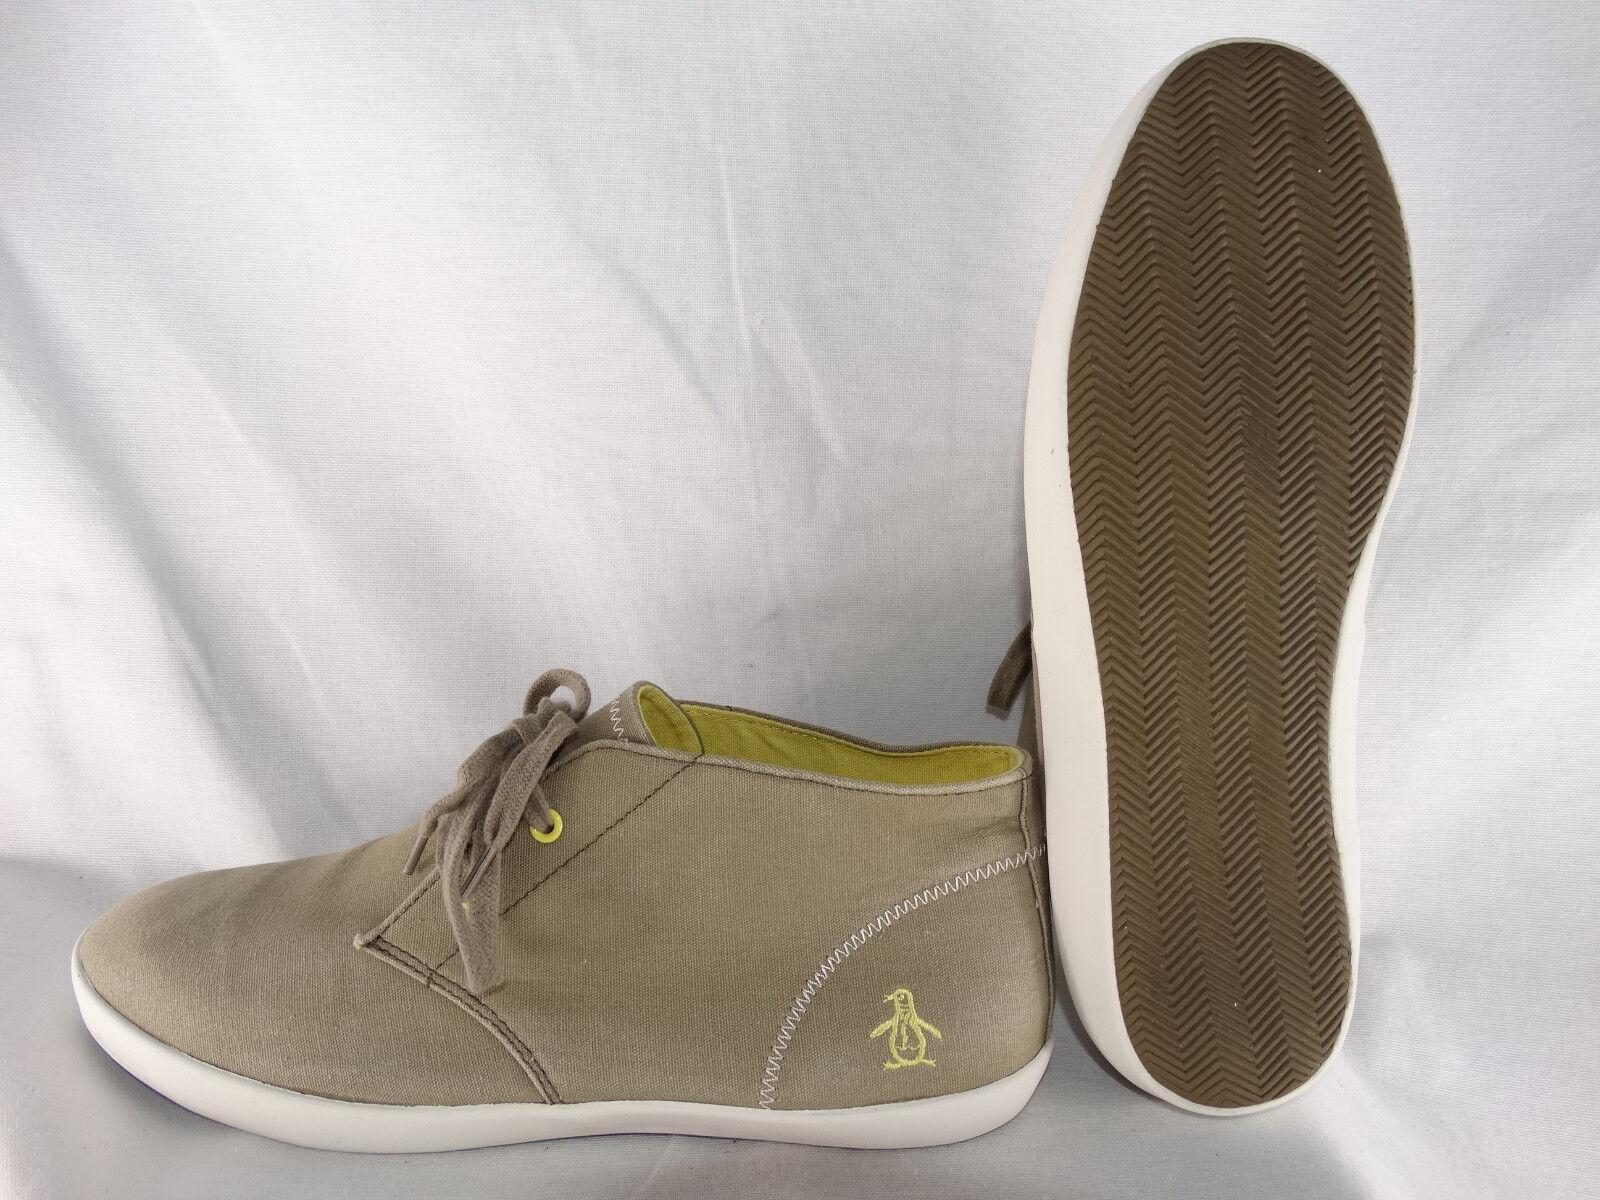 Penguin PG Chukka Mid Canvas Sneaker schilf-gelb-weiß EU 42,5 US 9,5